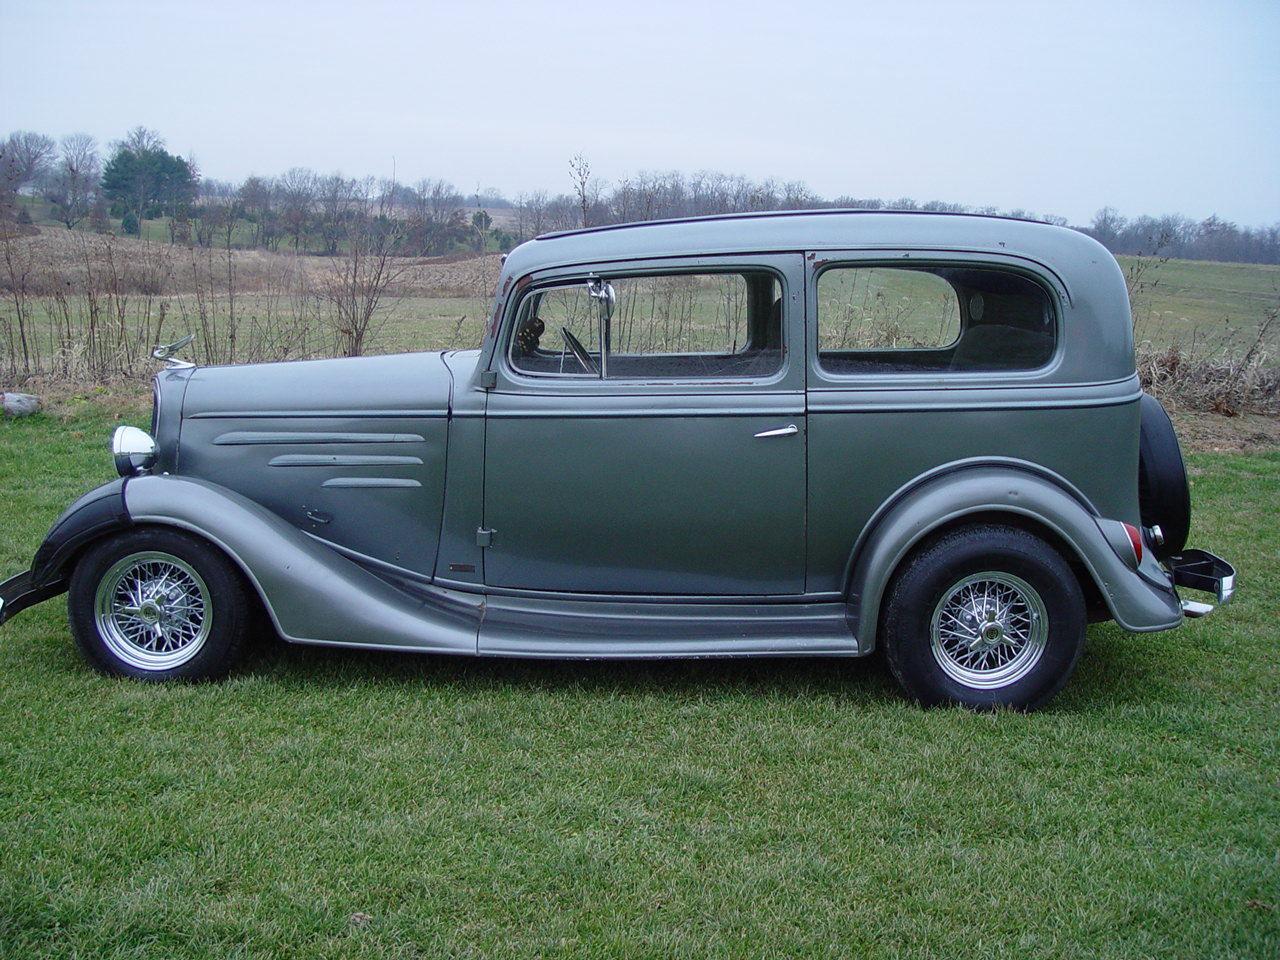 1 n r 1934 chevy 2 door sedan street rod barn find cool for 1934 chevrolet 2 door sedan